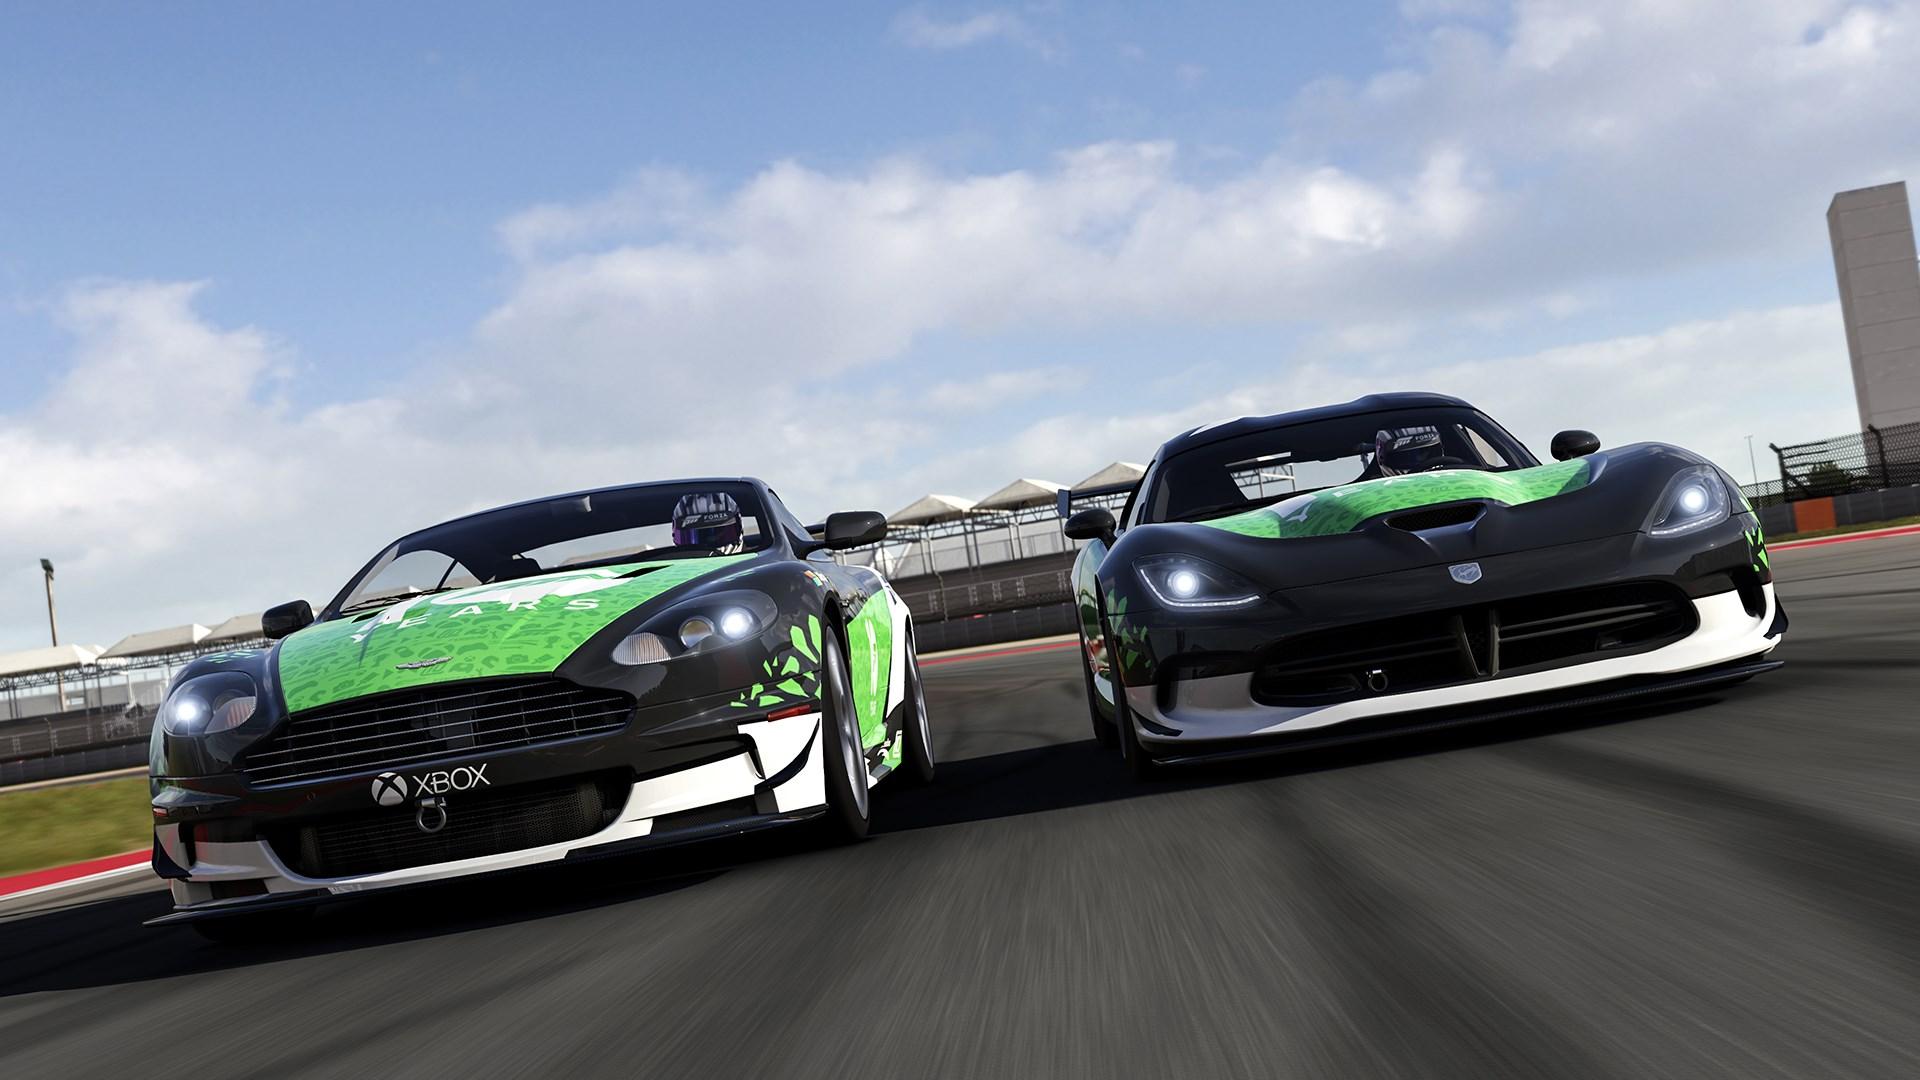 Forza Motorsport 6/Ten Year Anniversary Car Pack